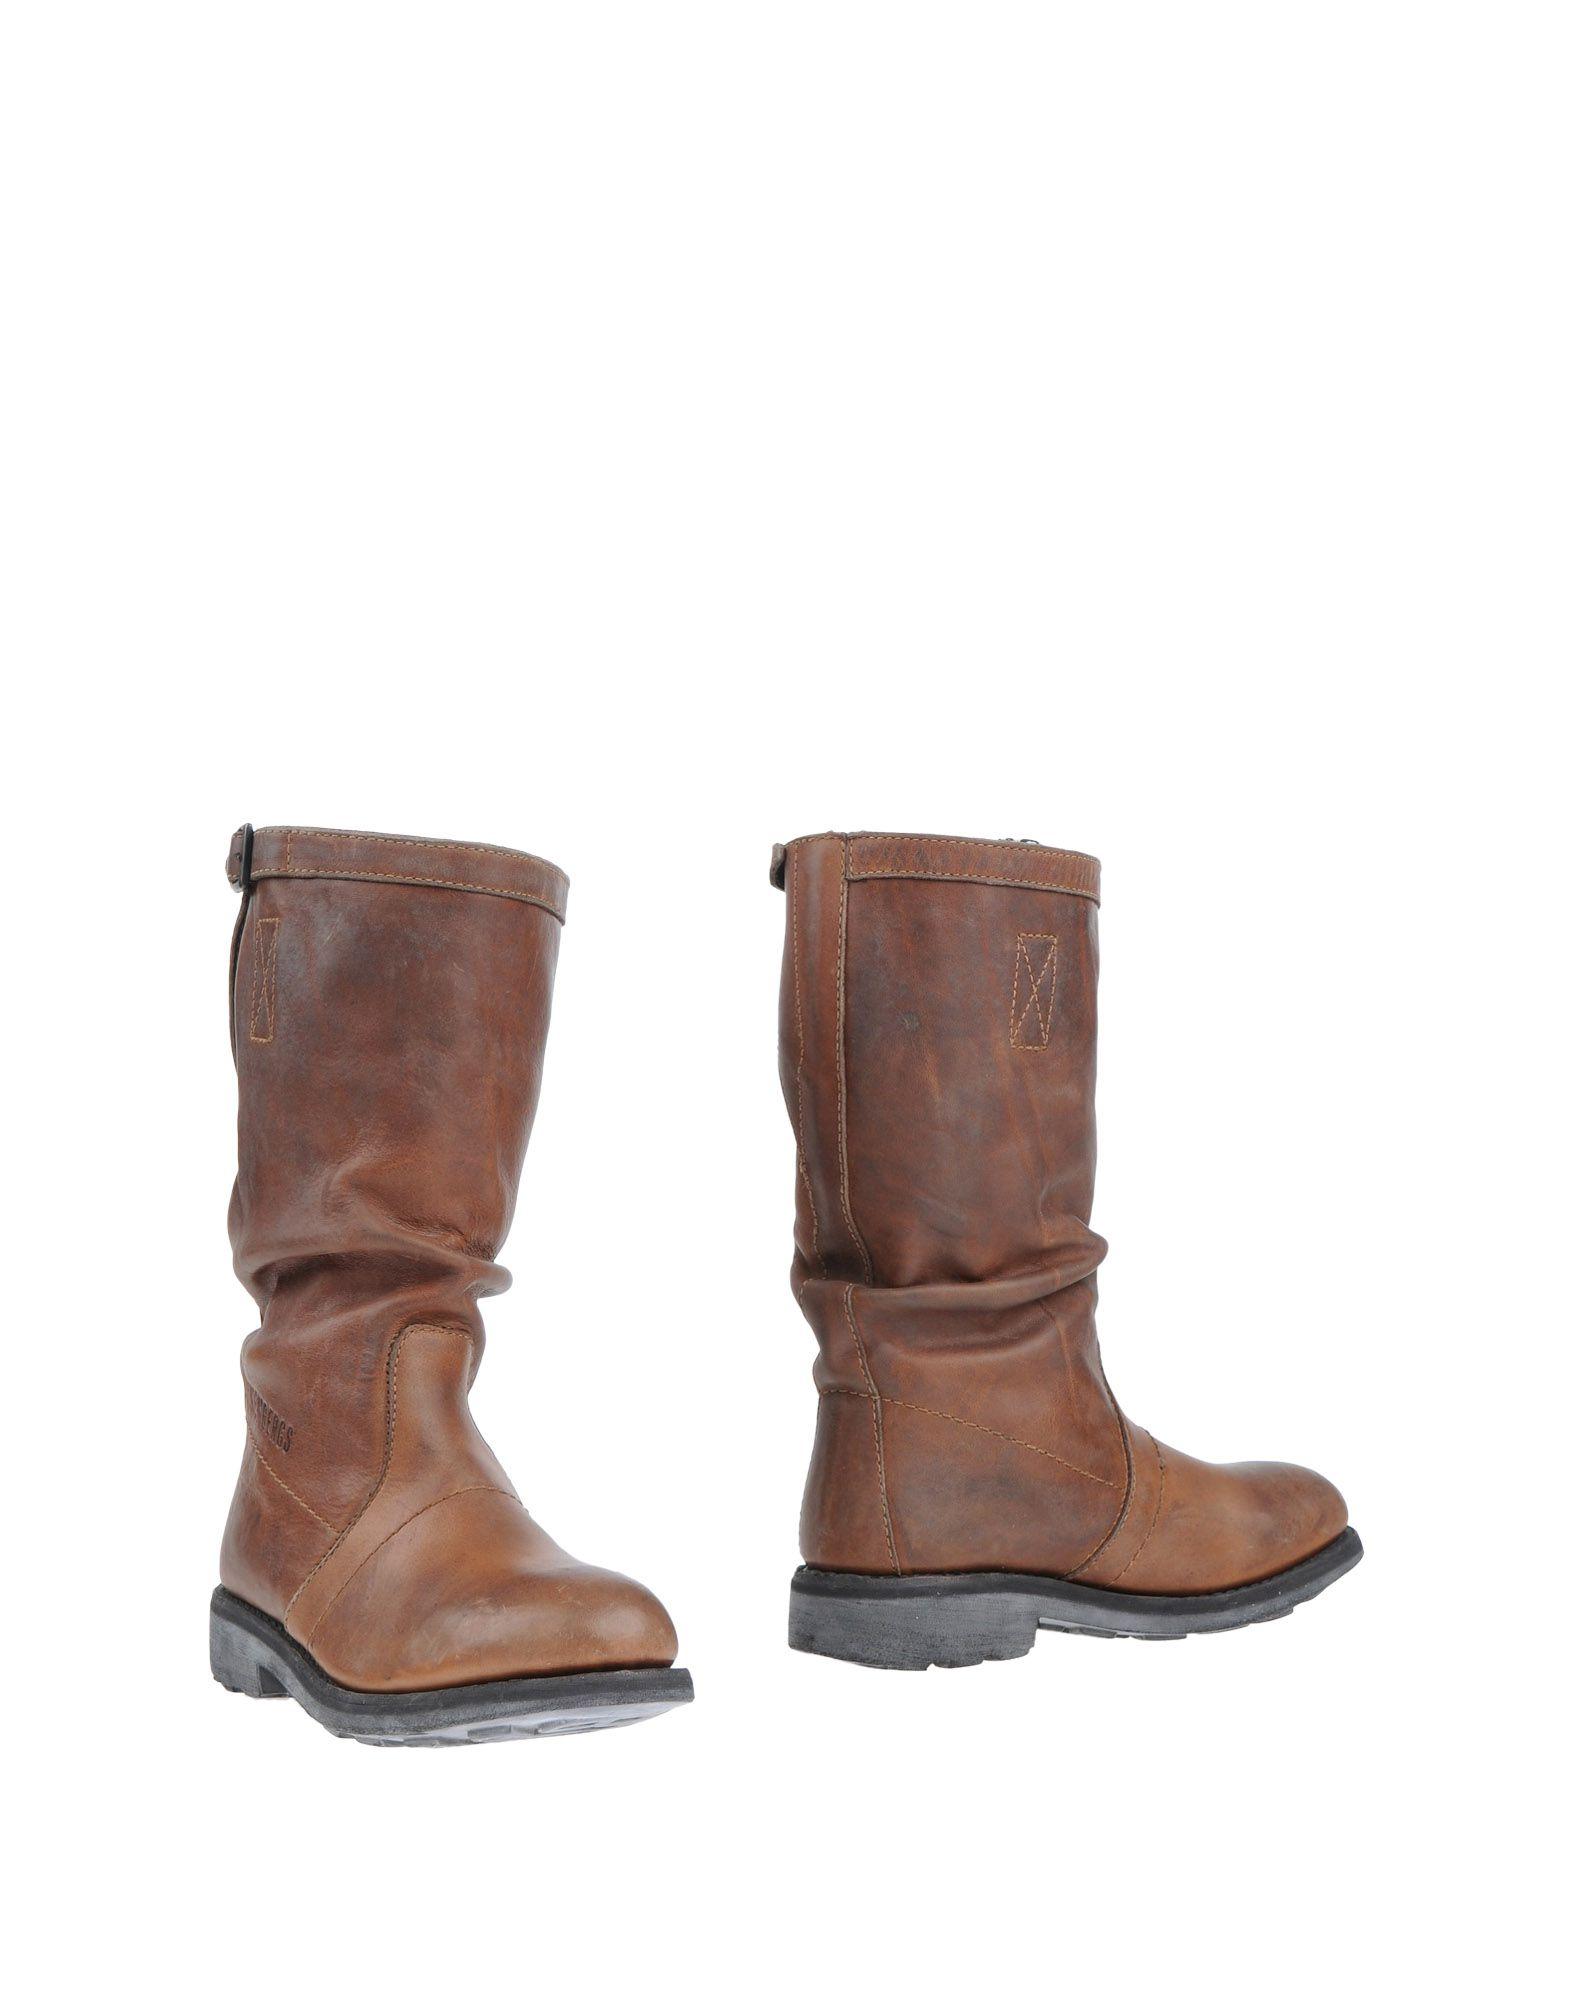 Bikkembergs Heiße Stiefel Damen  11328251FS Heiße Bikkembergs Schuhe 035ba7